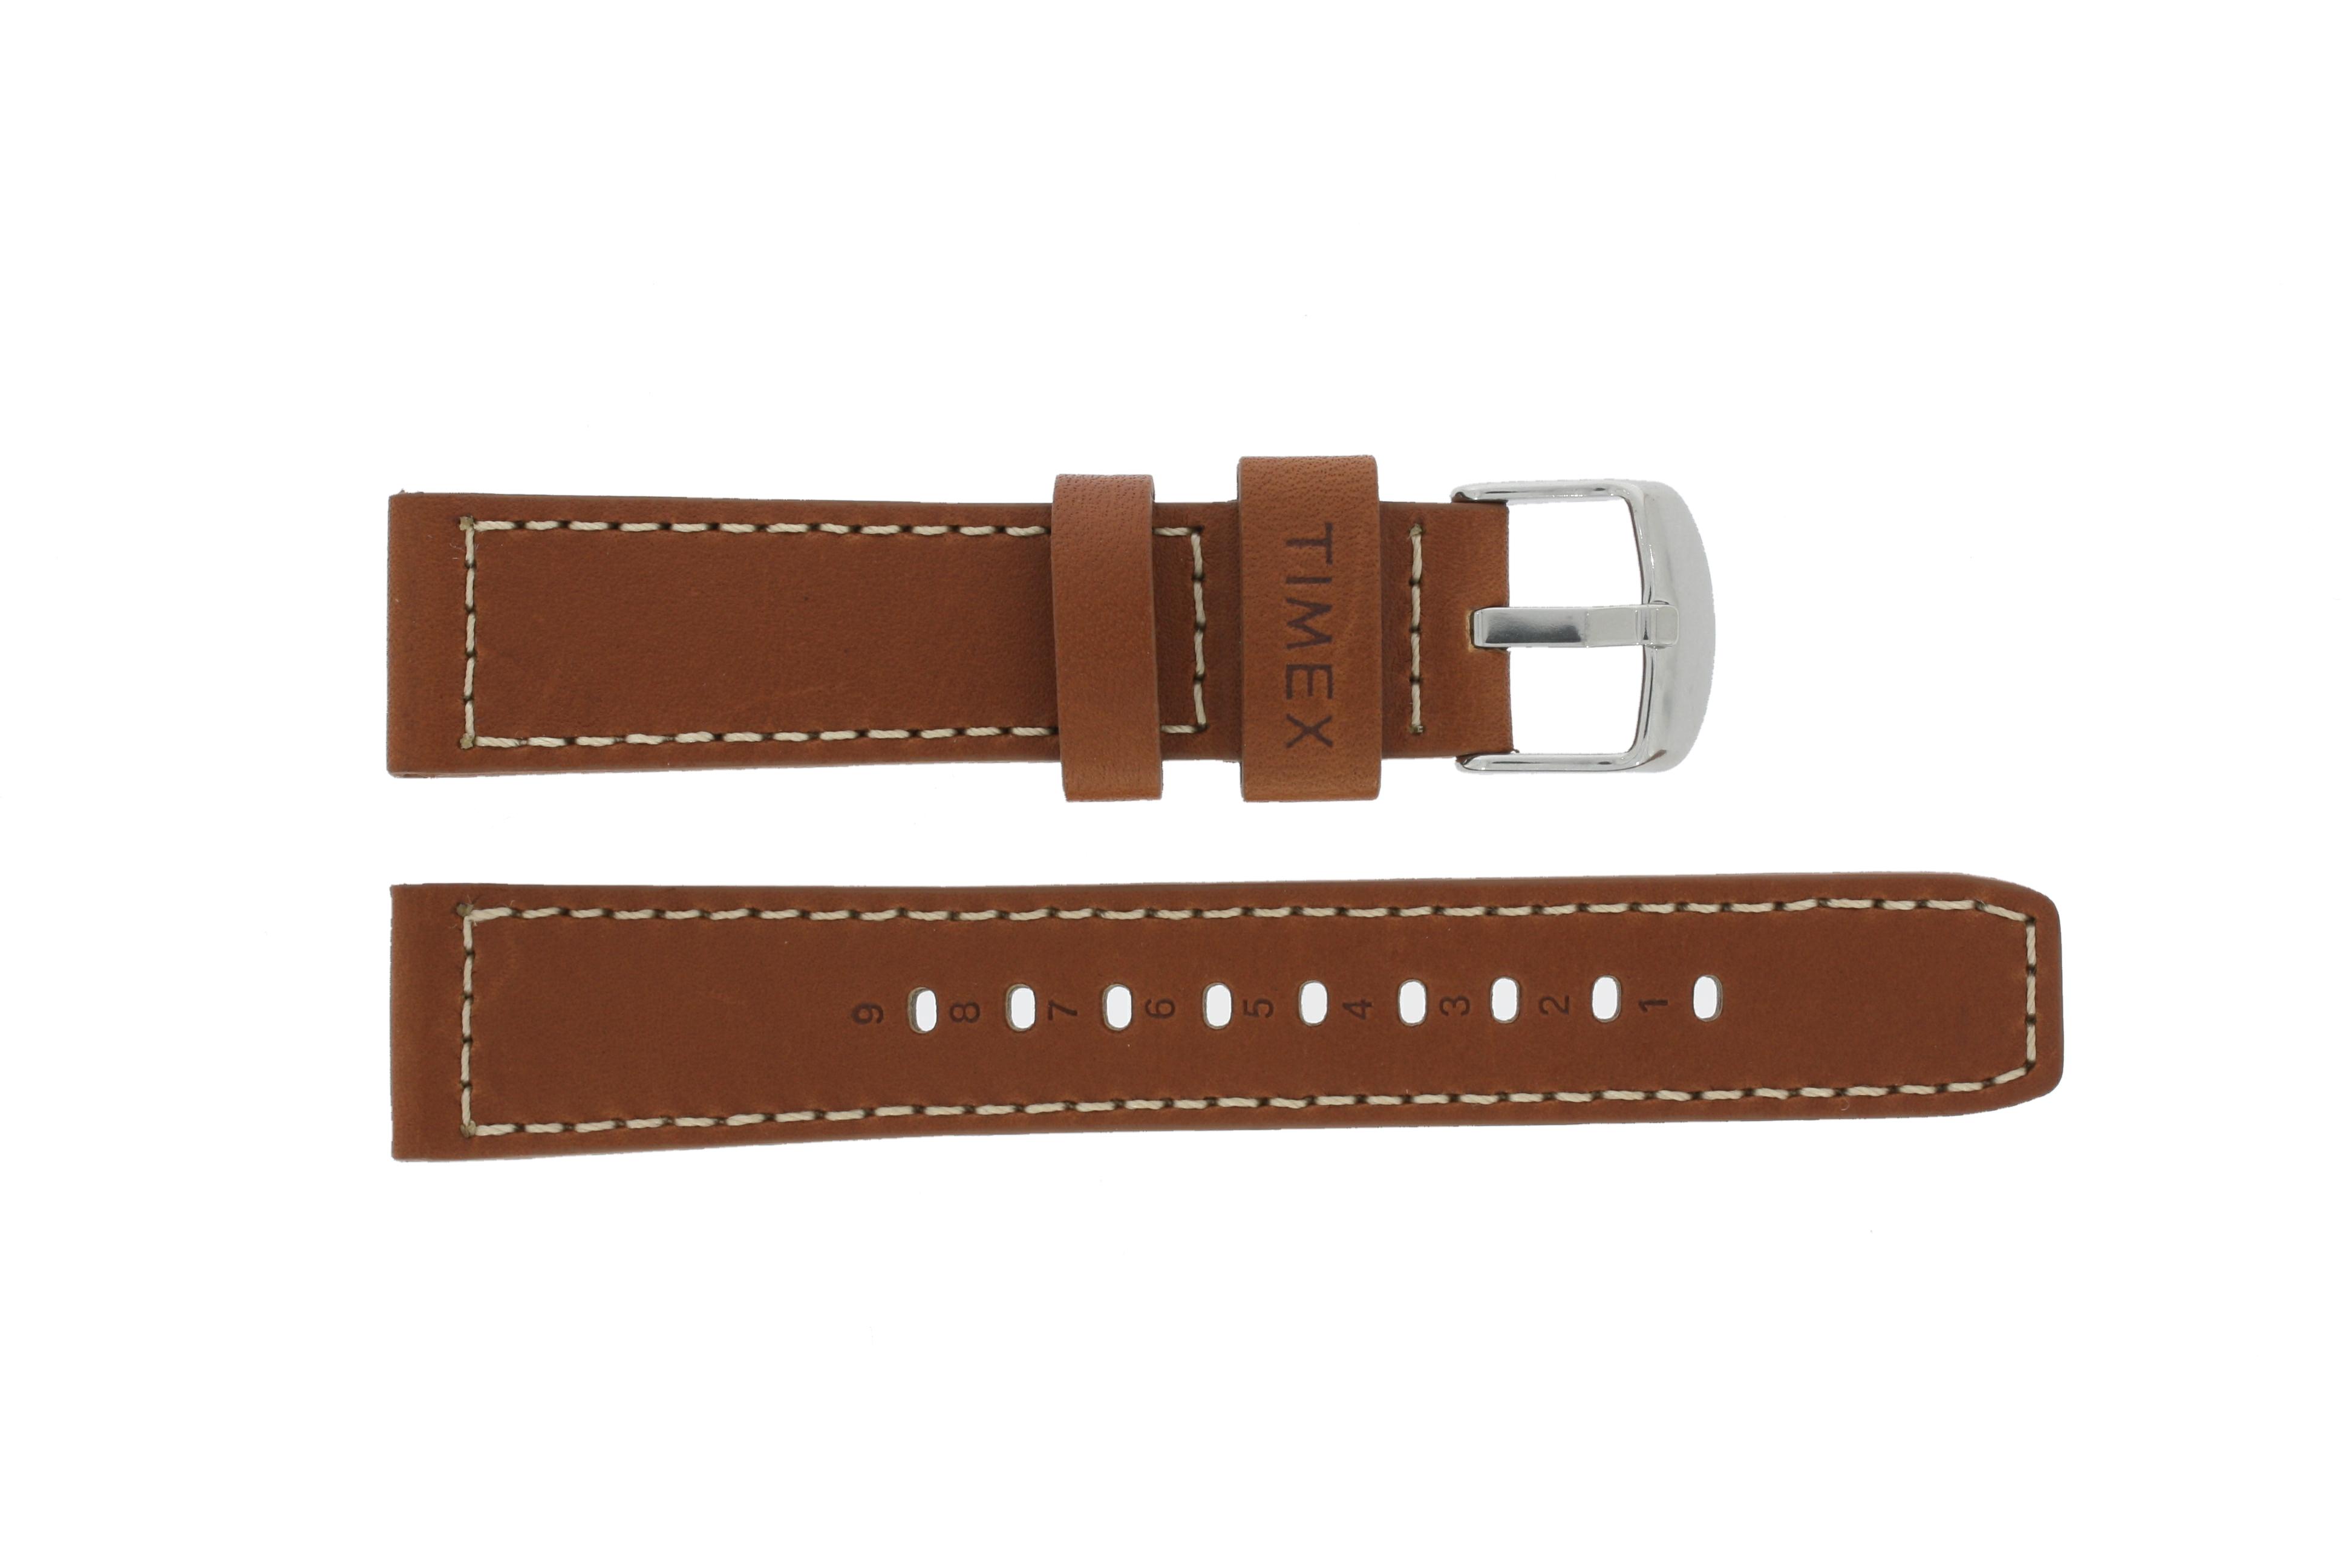 Timex horlogeband PW2P84000 Leder Bruin 20mm + wit stiksel